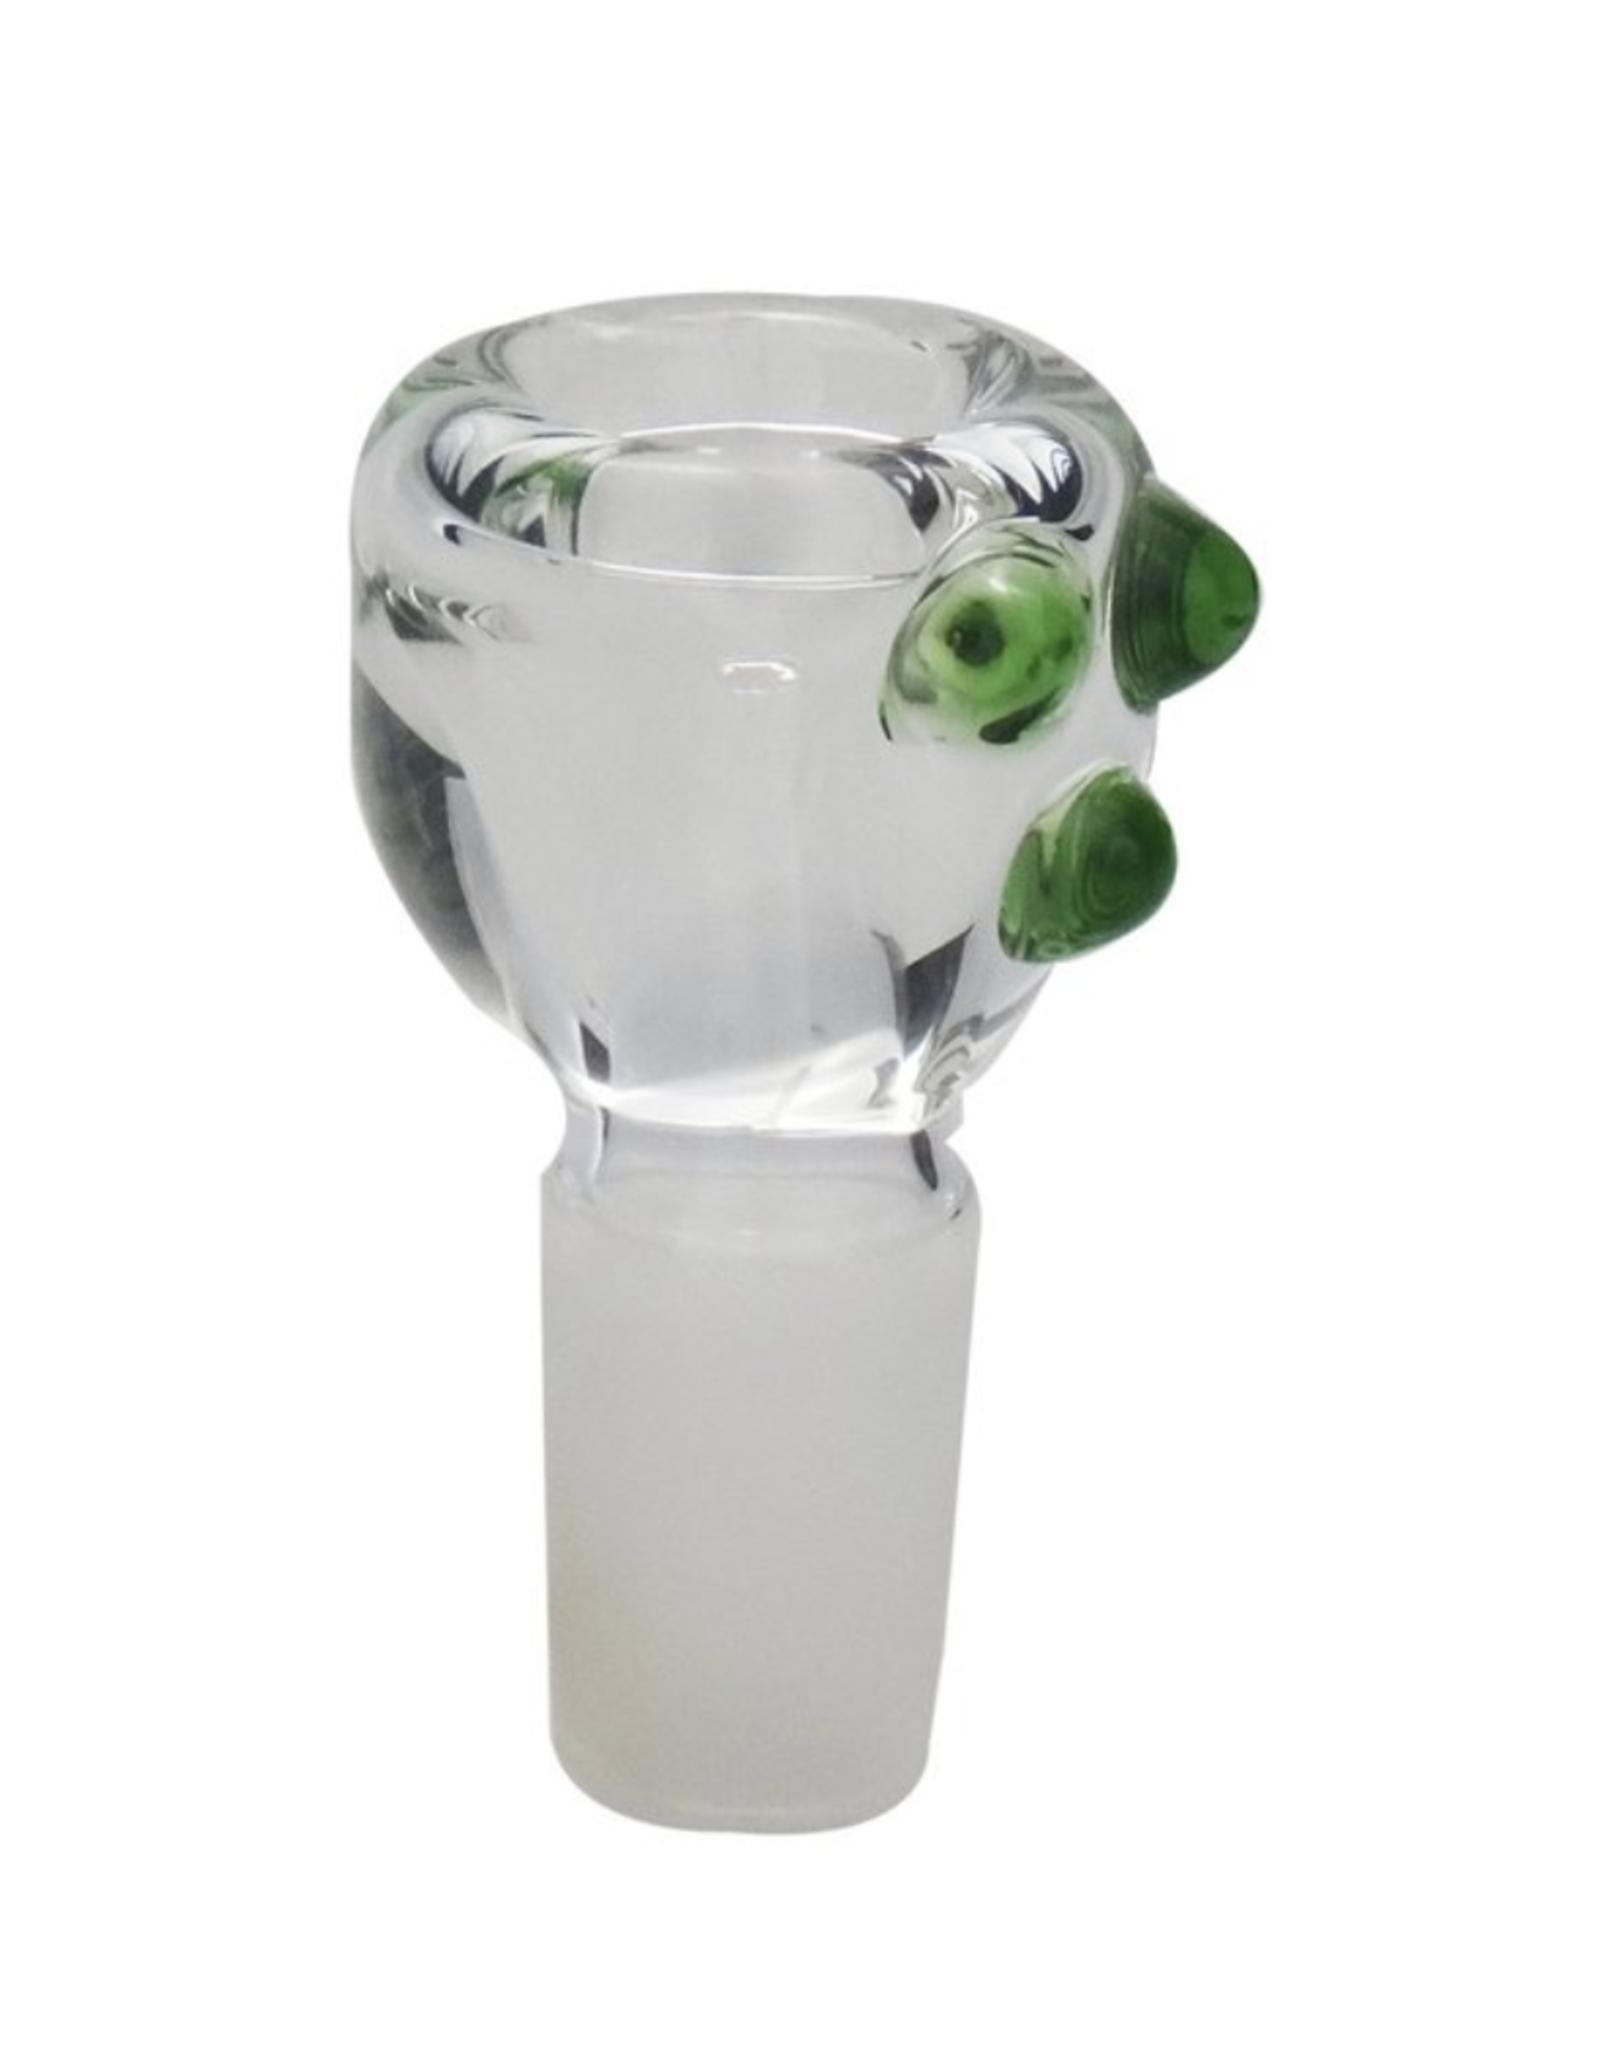 19mm Male Heavy Glass Bowl w/ Nubs